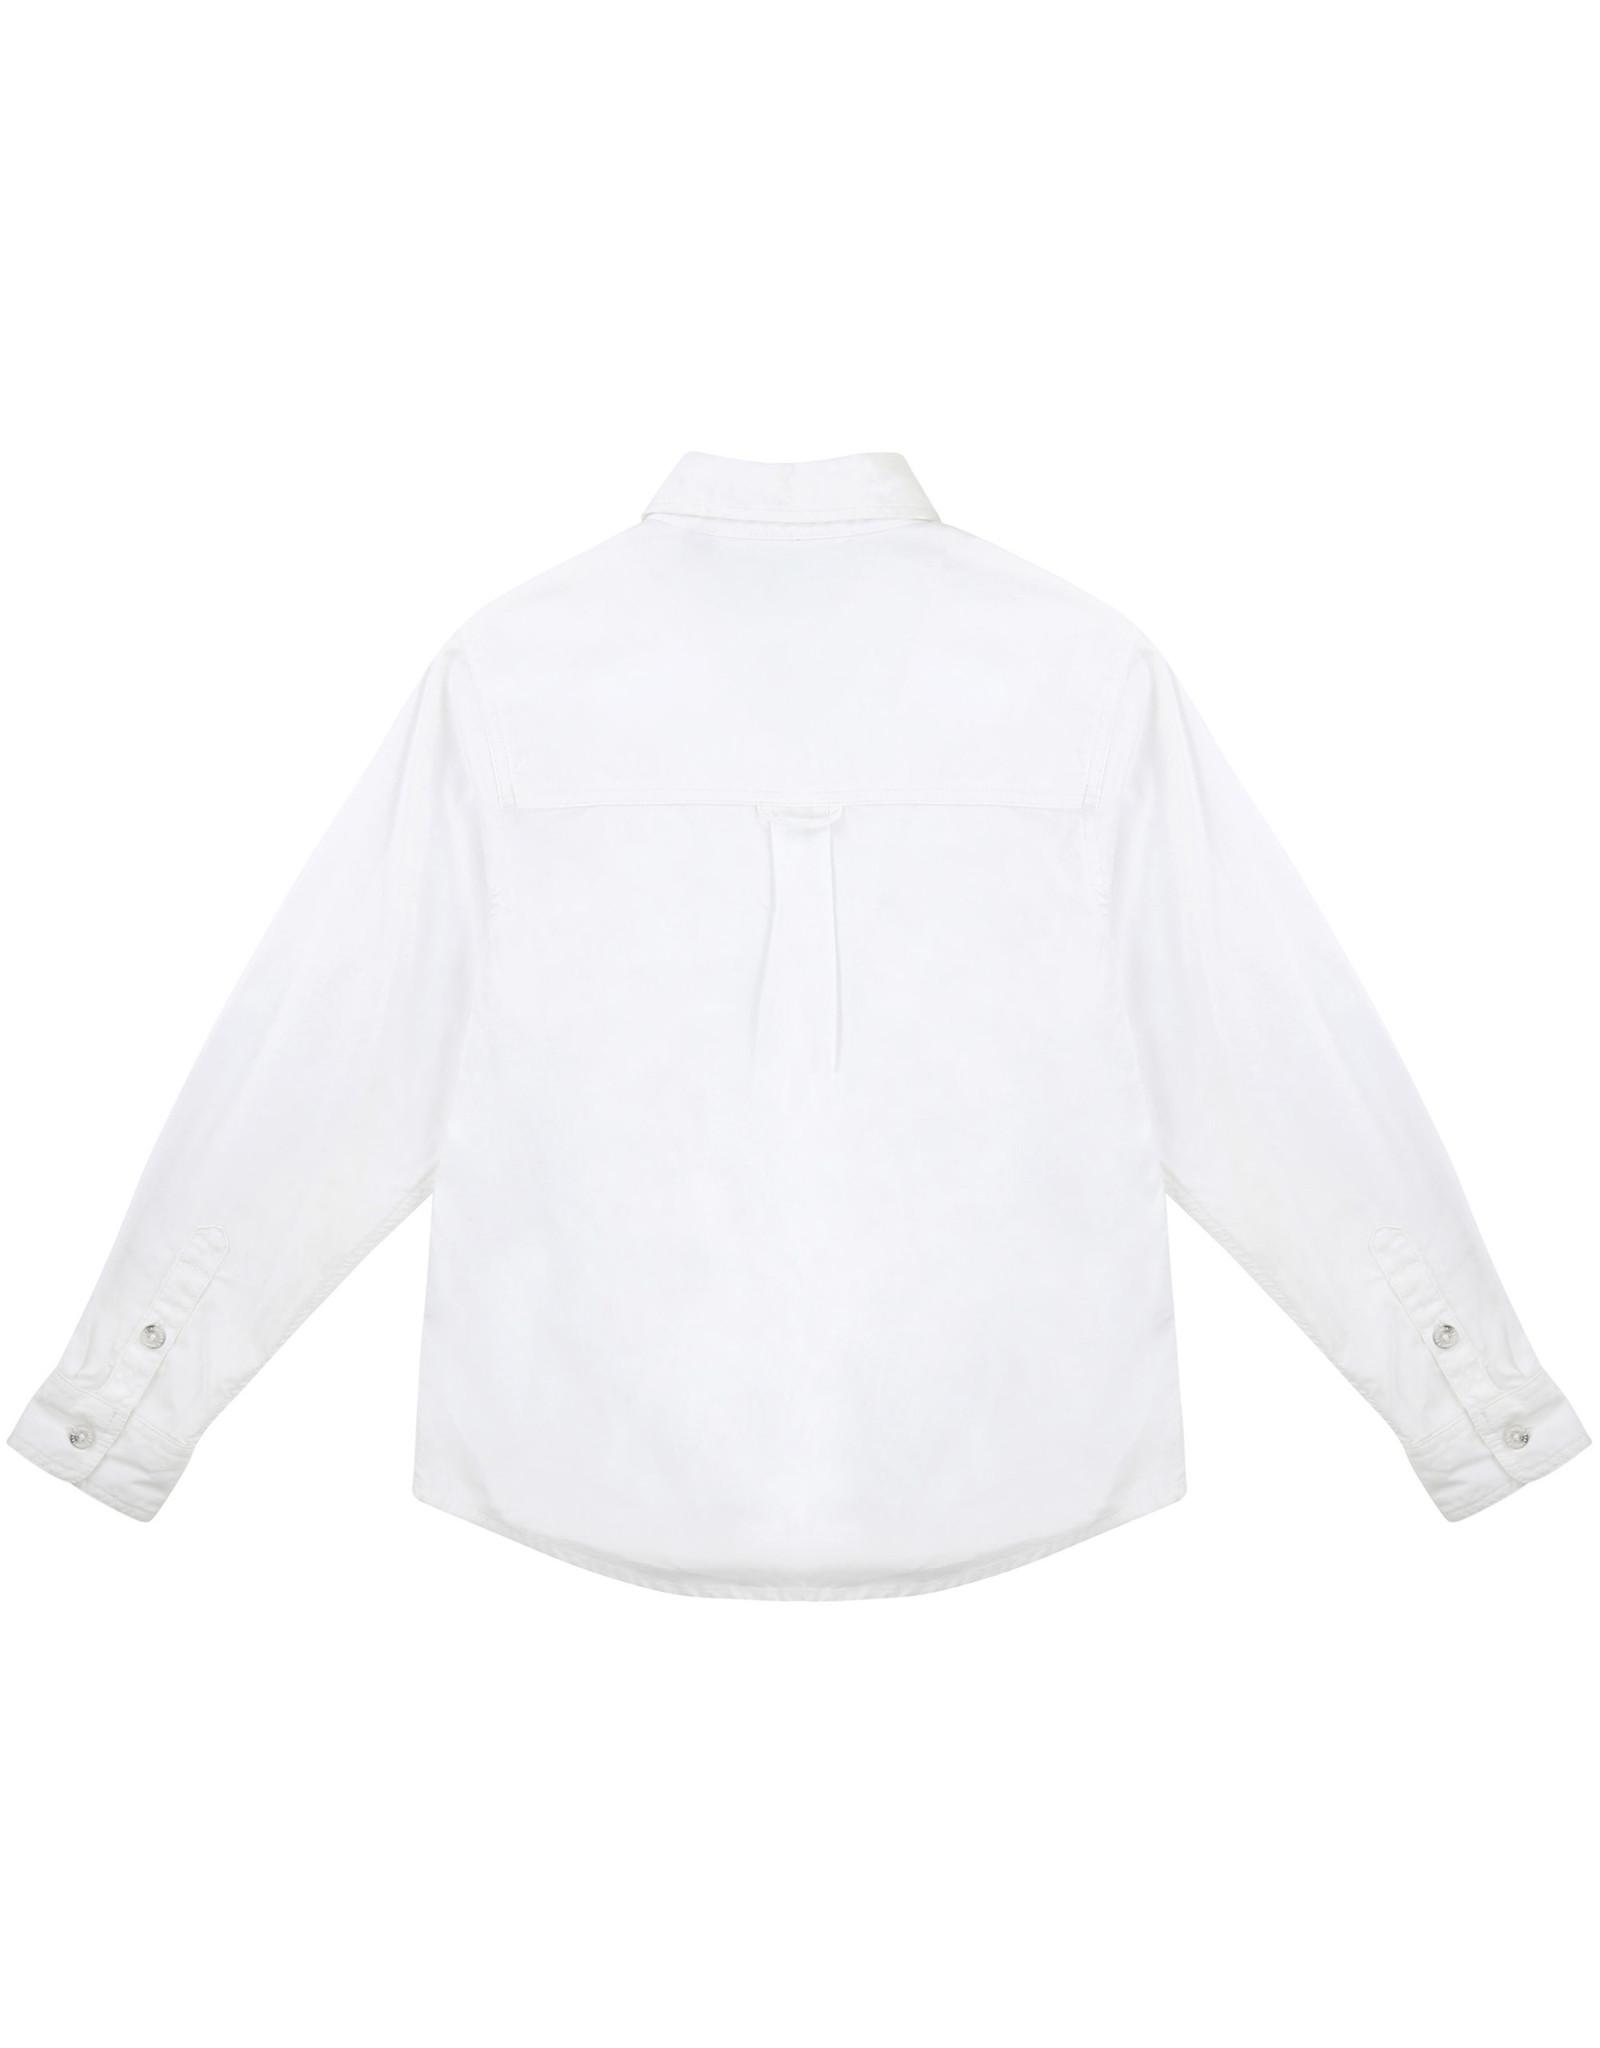 Timberland SS21 T25S23 wit hemd